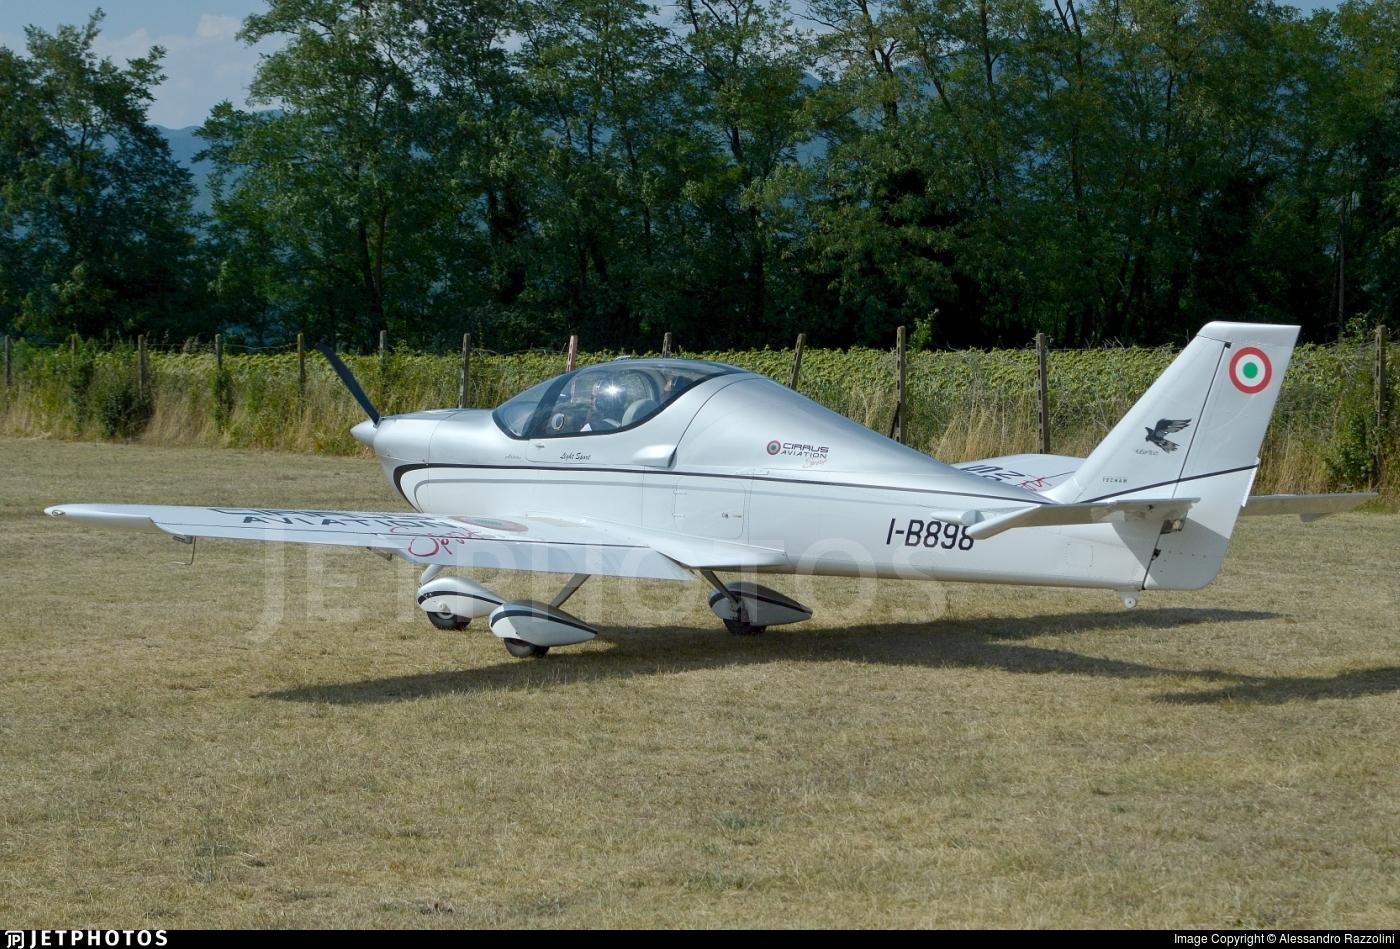 I-B898 - Tecnam Astore - Cirrus Aviation